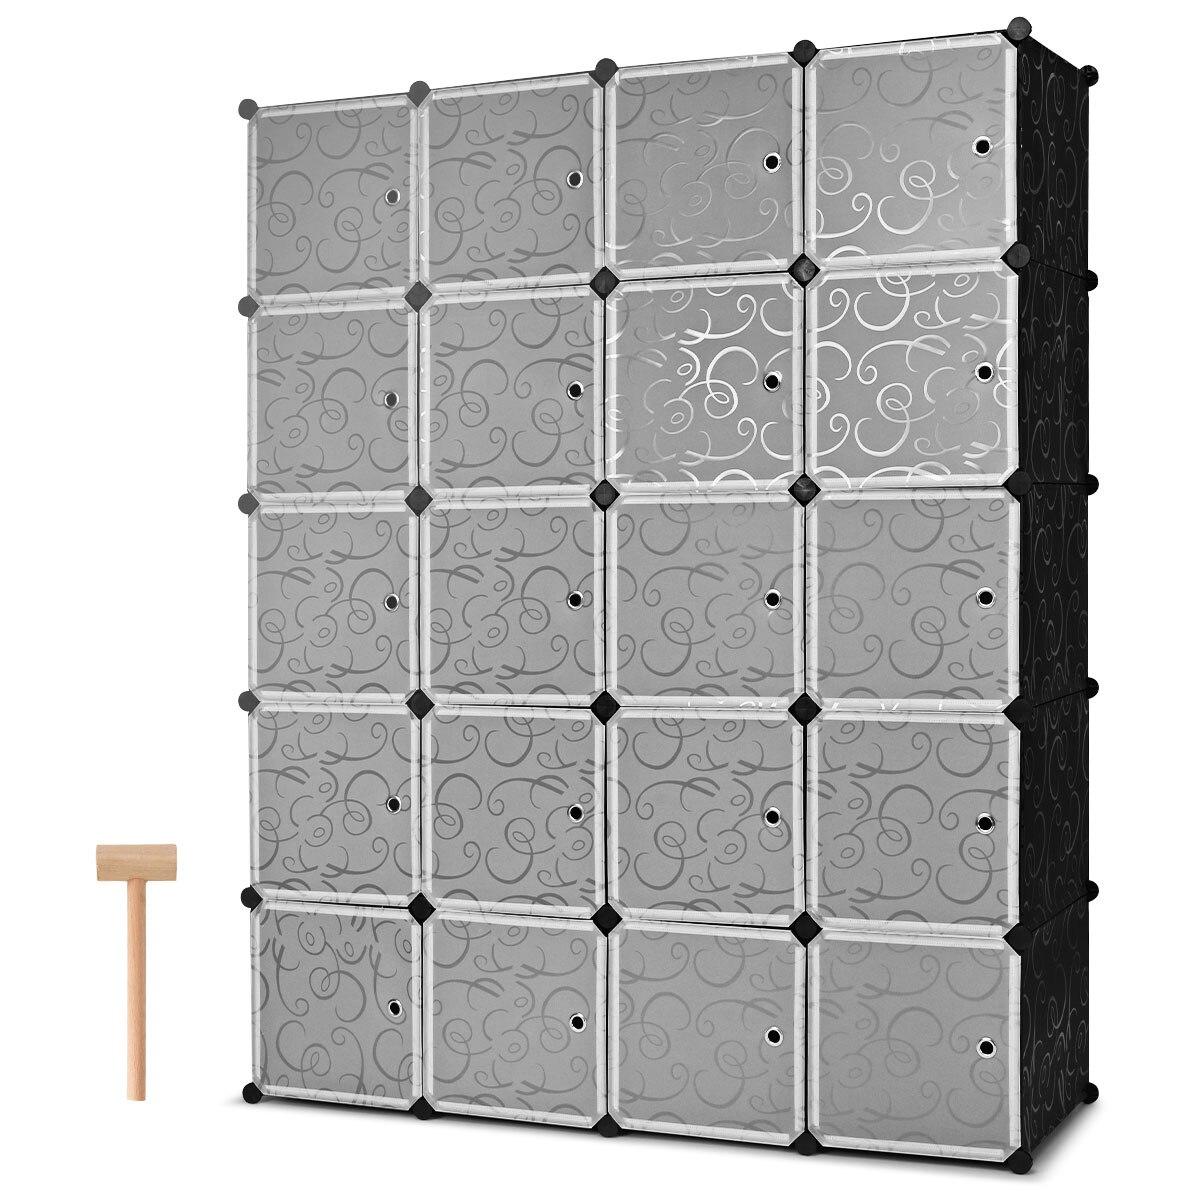 Costway DIY 20 Cube Portable font b Closet b font Storage Organizer Clothes Wardrobe Cabinet W